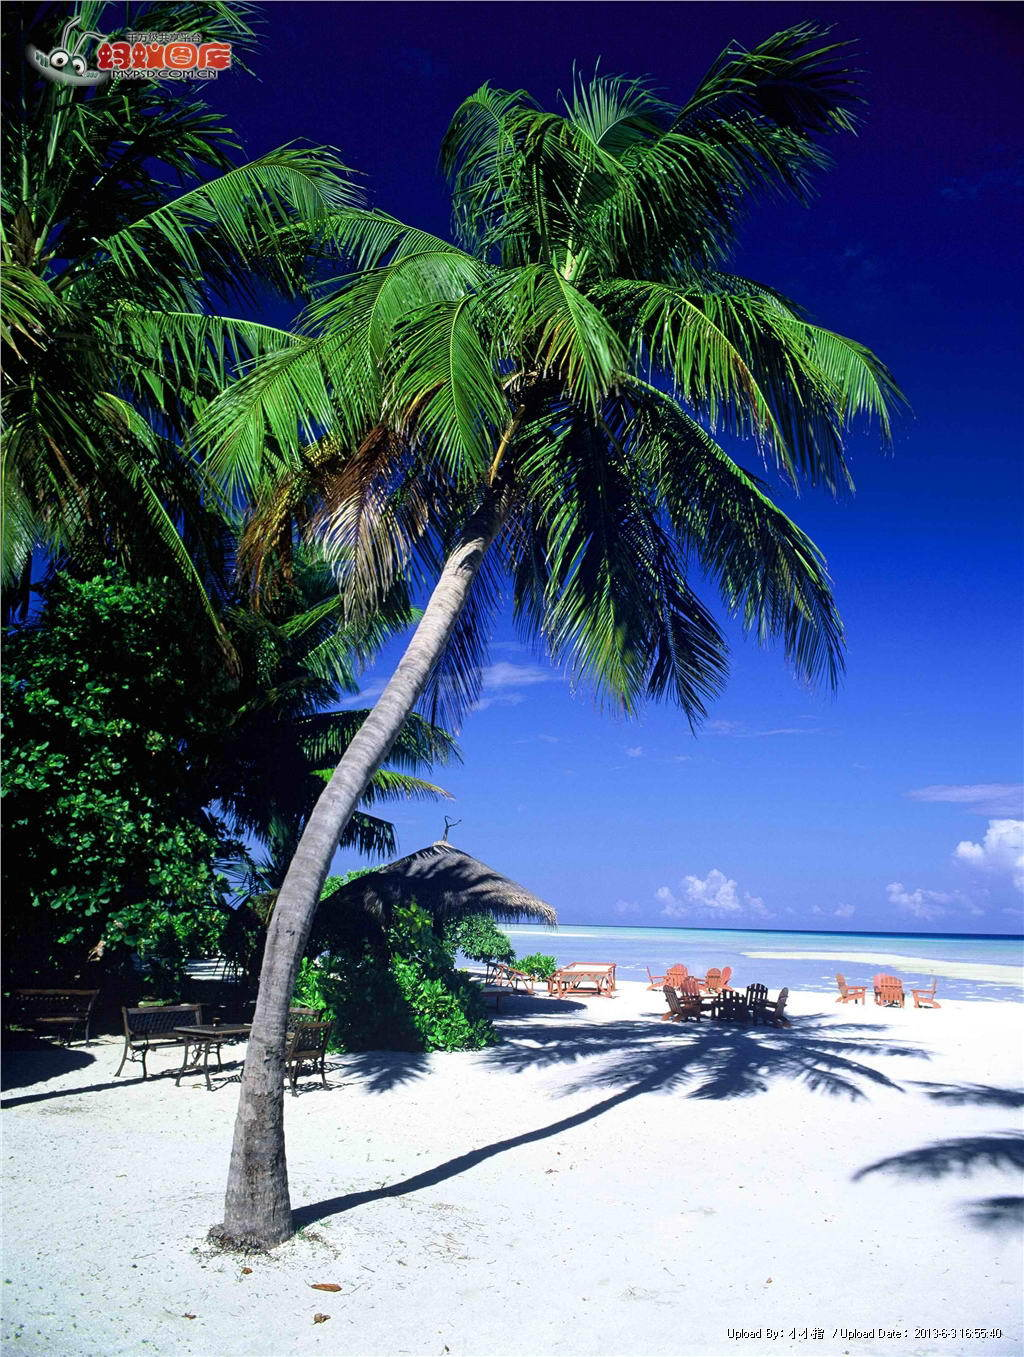 2k椰子樹風景豎屏壁紙